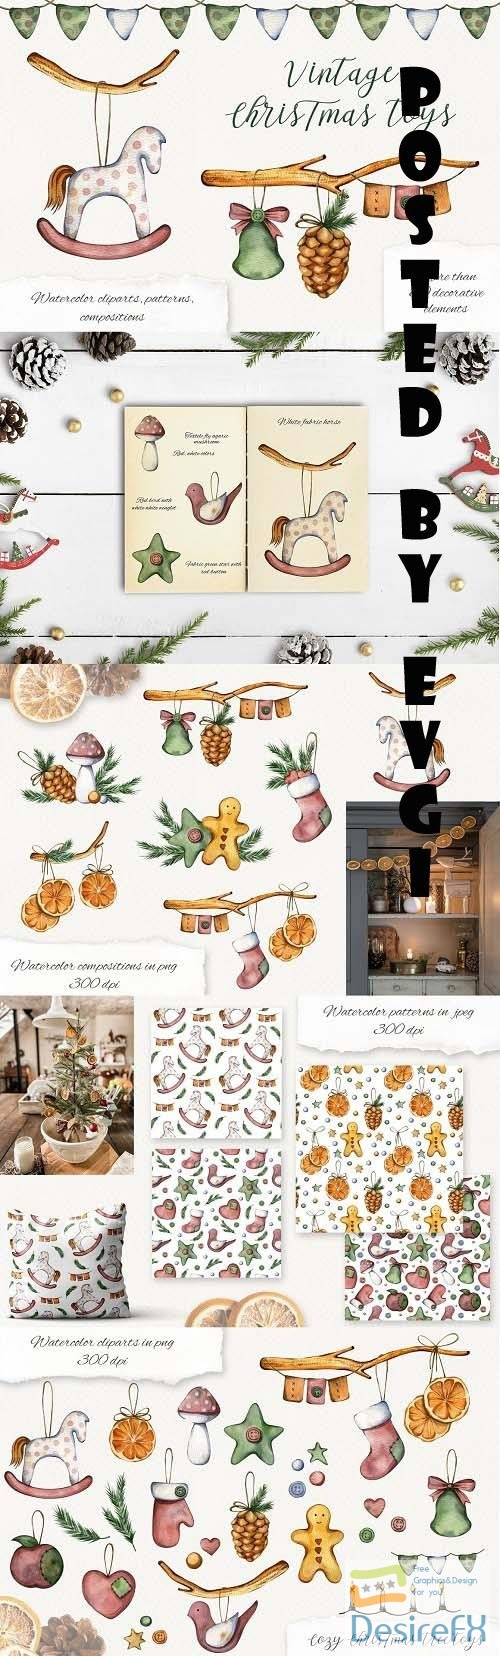 Vintage Christmas toys - 6591291